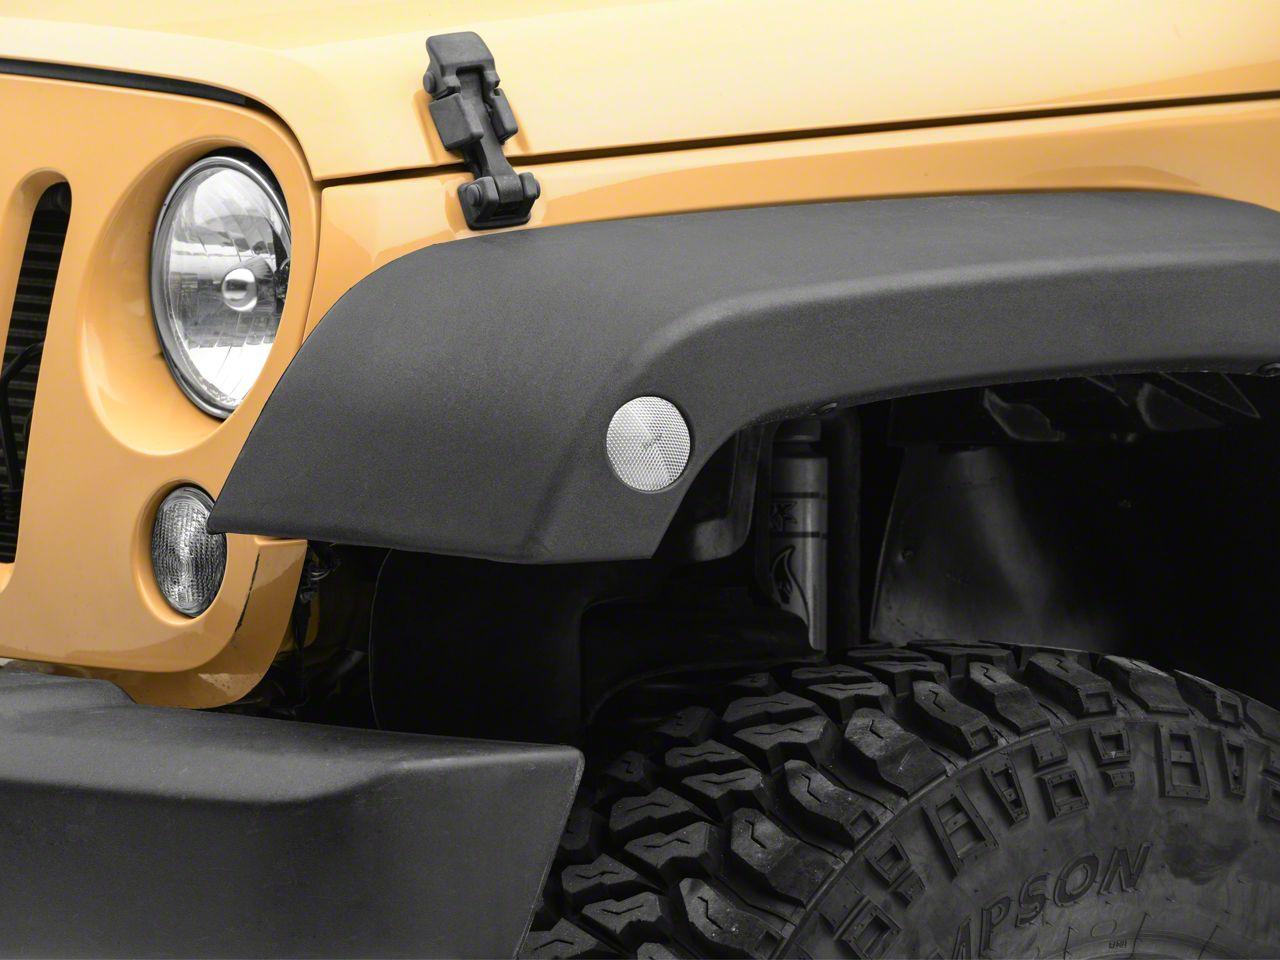 RT Off-Road Side Marker Light Kit - Clear (07-18 Jeep Wrangler JK)